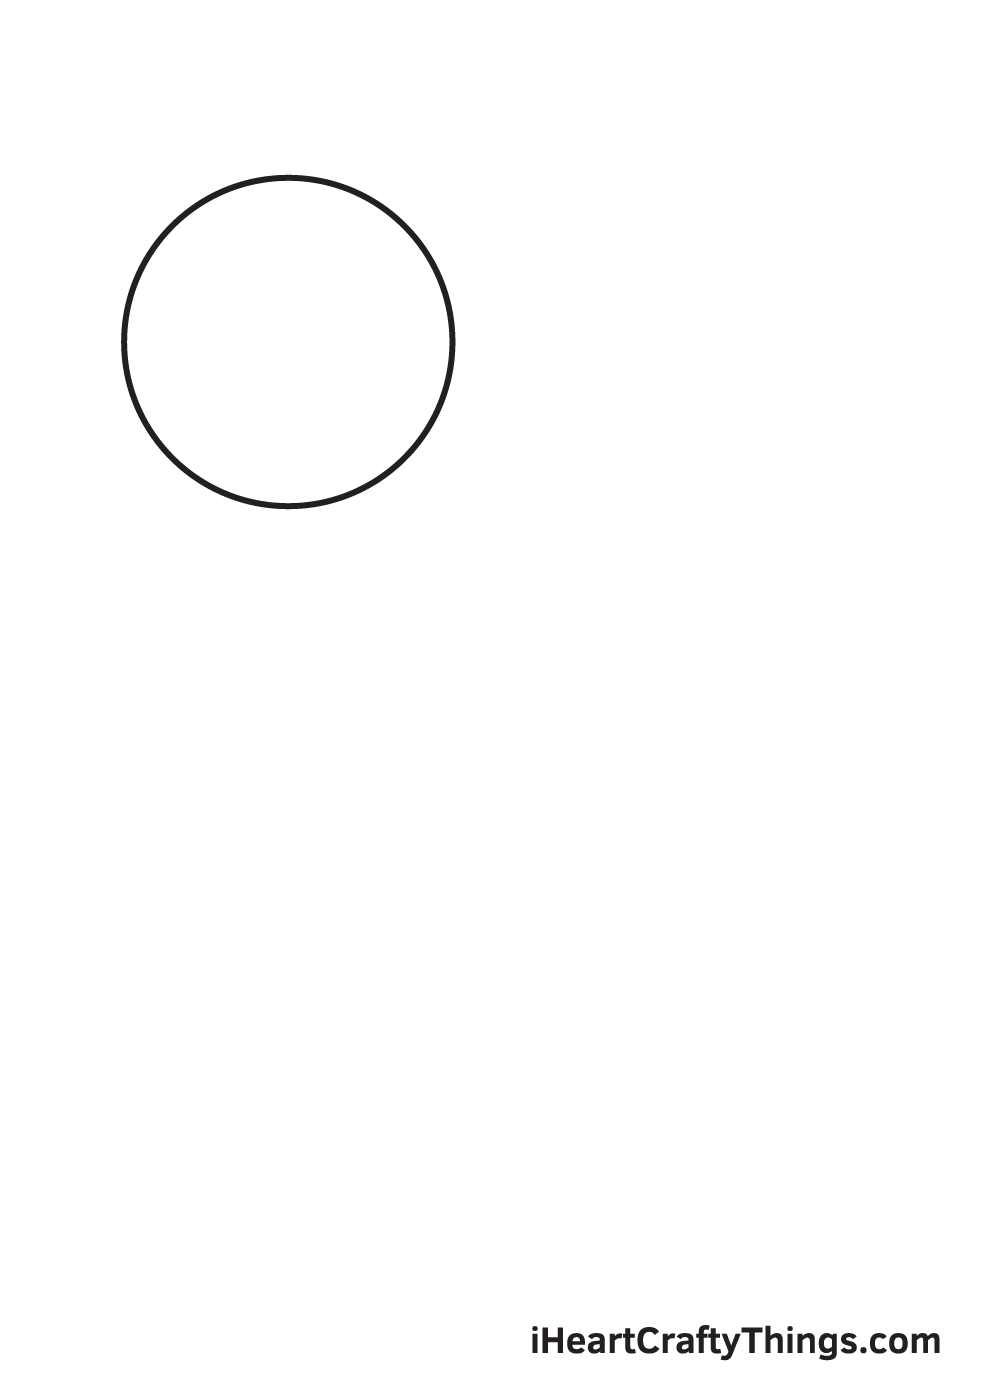 galaxy drawing - step 1